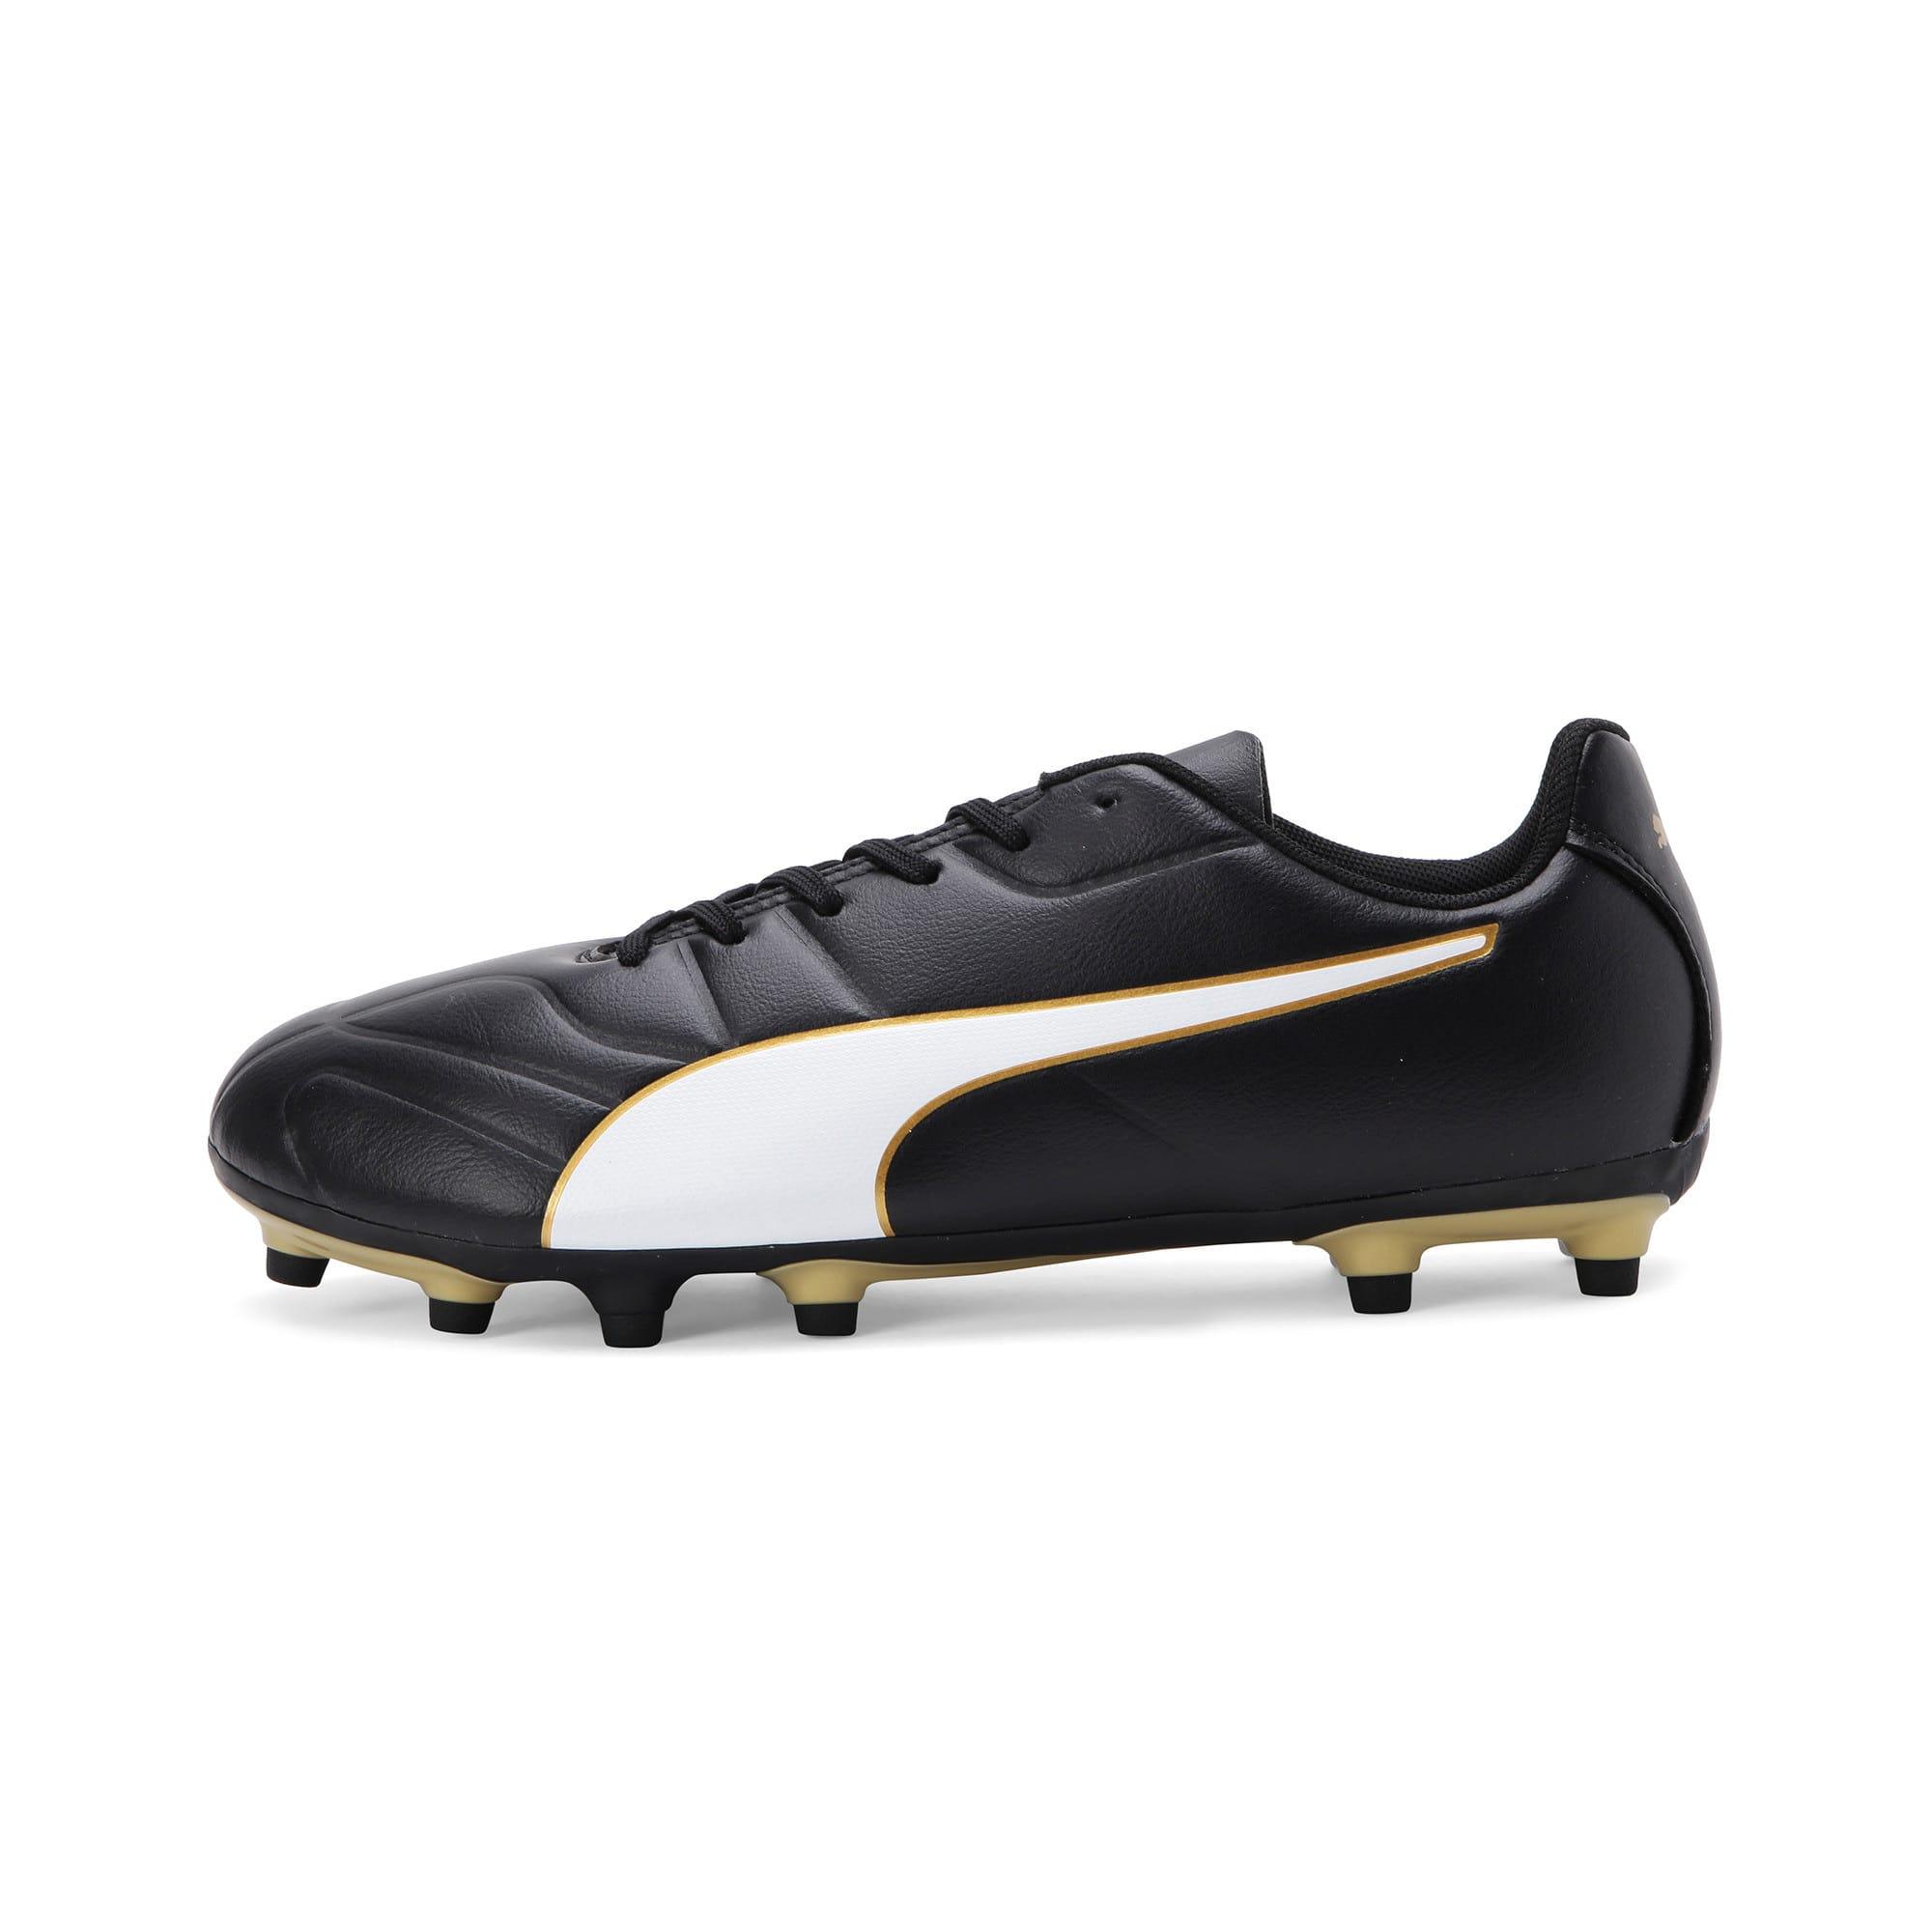 Thumbnail 1 of Classico C II FG Men's Football Boots, Black-White-Gold, medium-IND